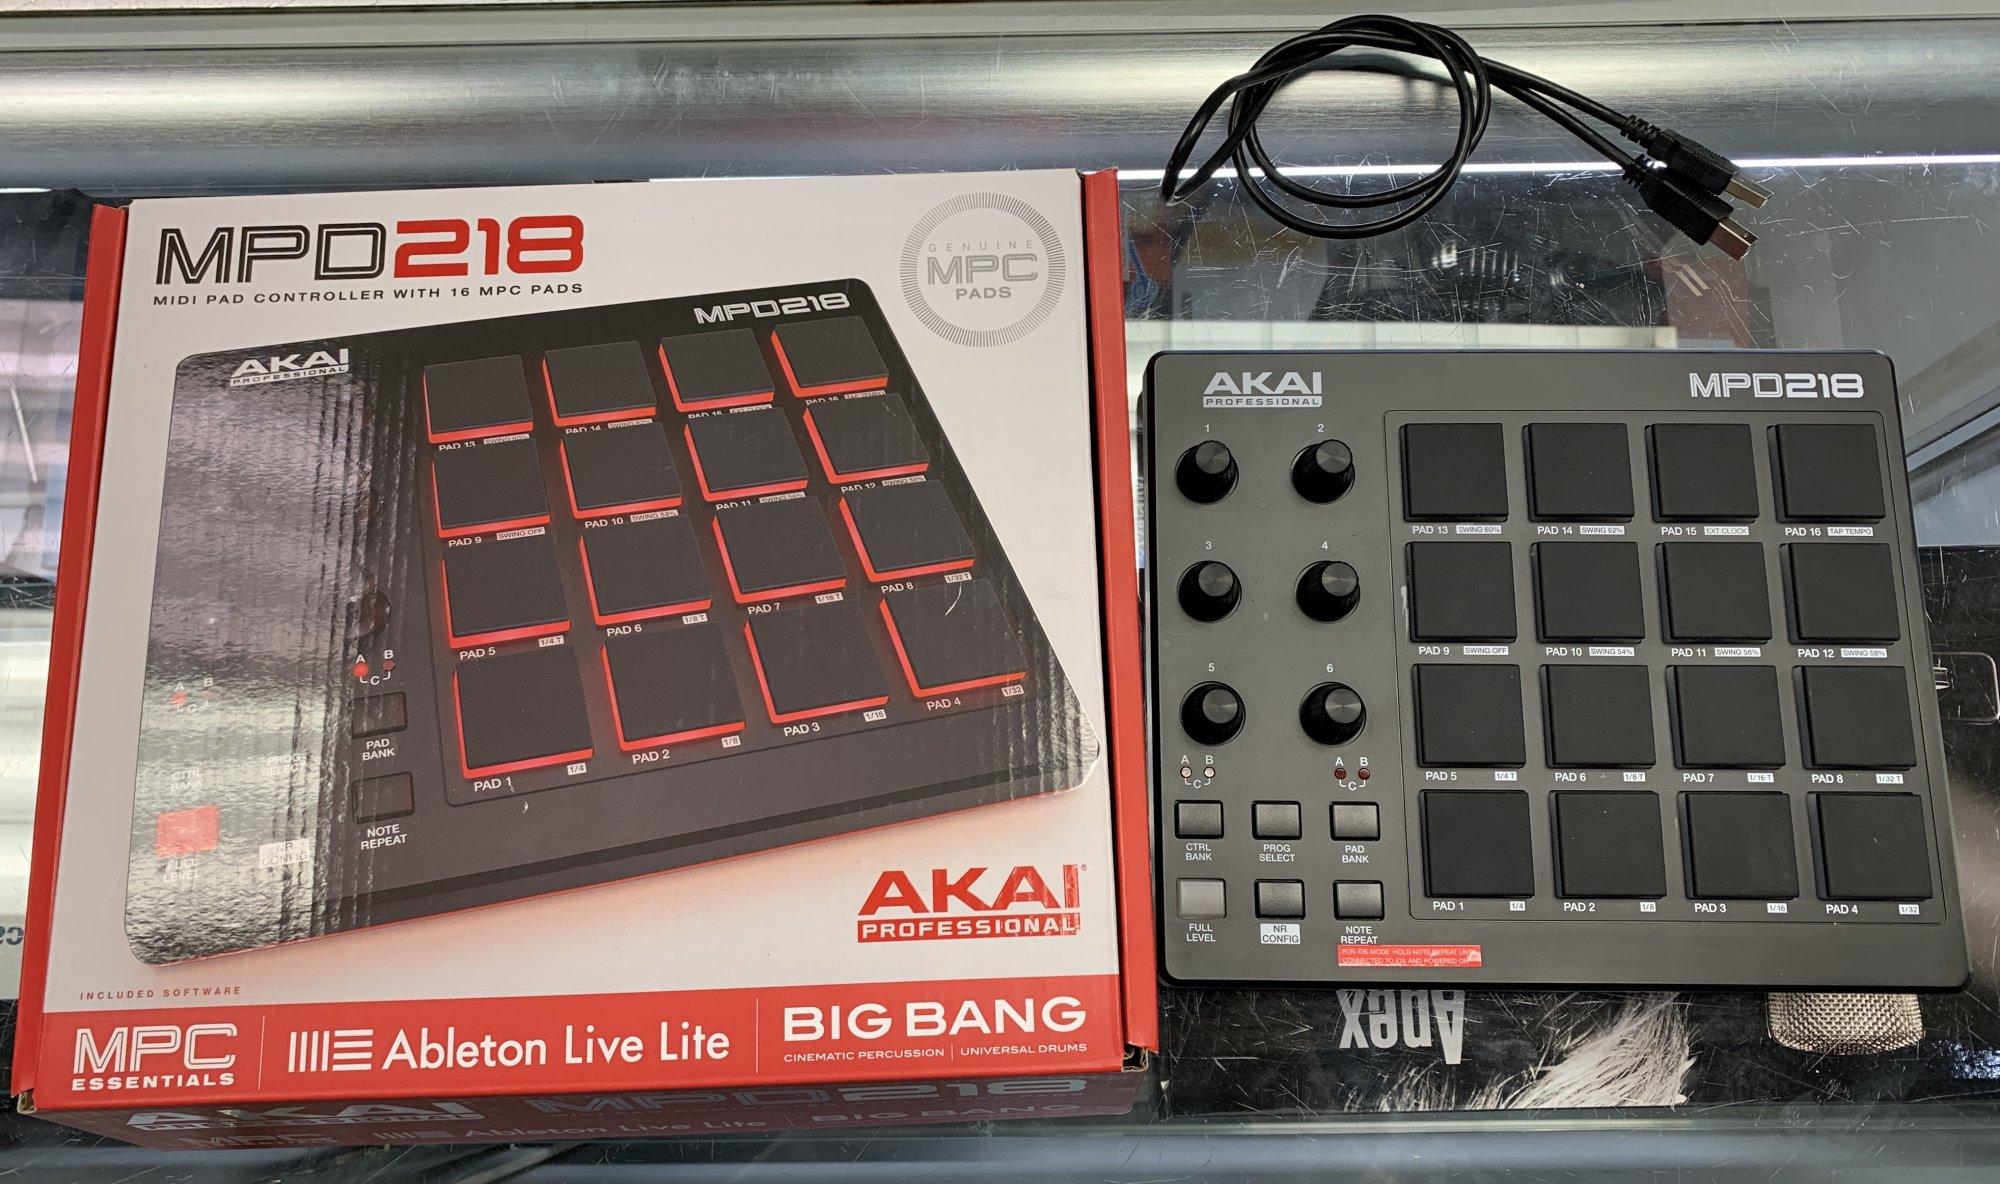 Akai MPD218 MIDI Pad Controller with 16 MPC Pads